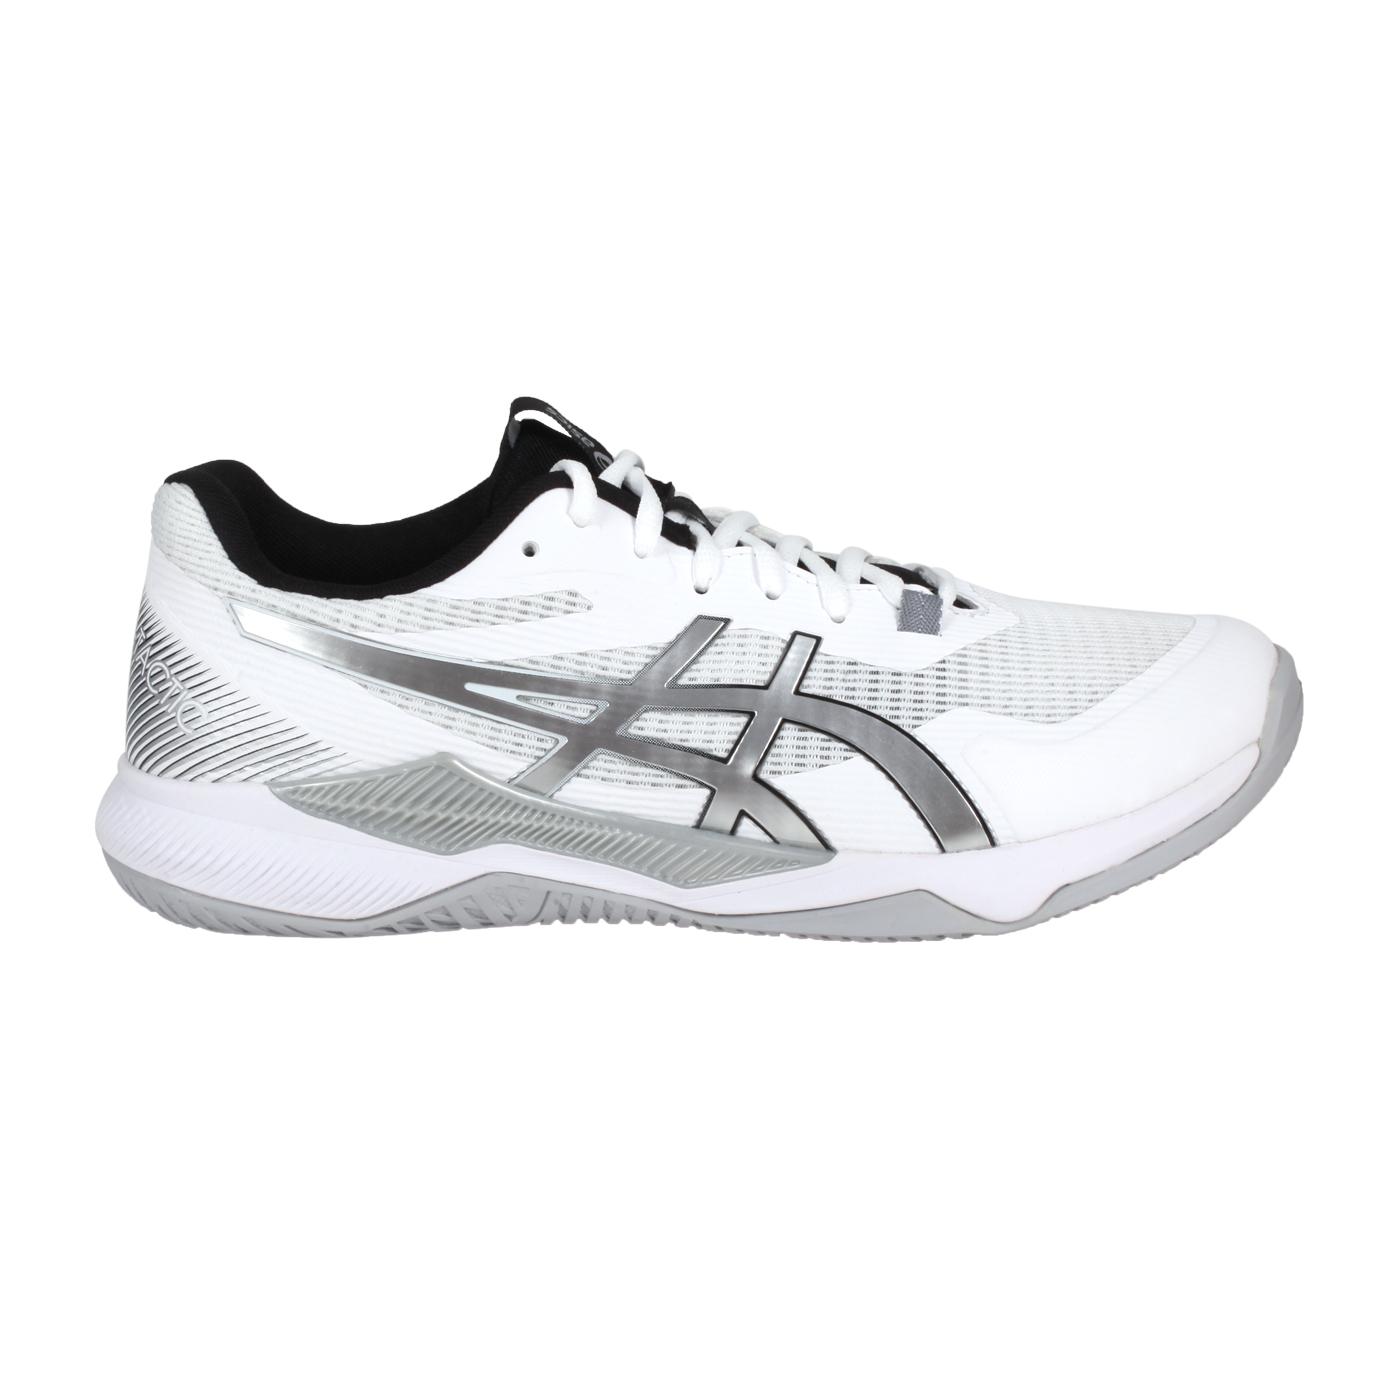 ASICS 男女排羽球鞋-2E  @GEL-TACTIC@1073A050-100 - 白銀黑